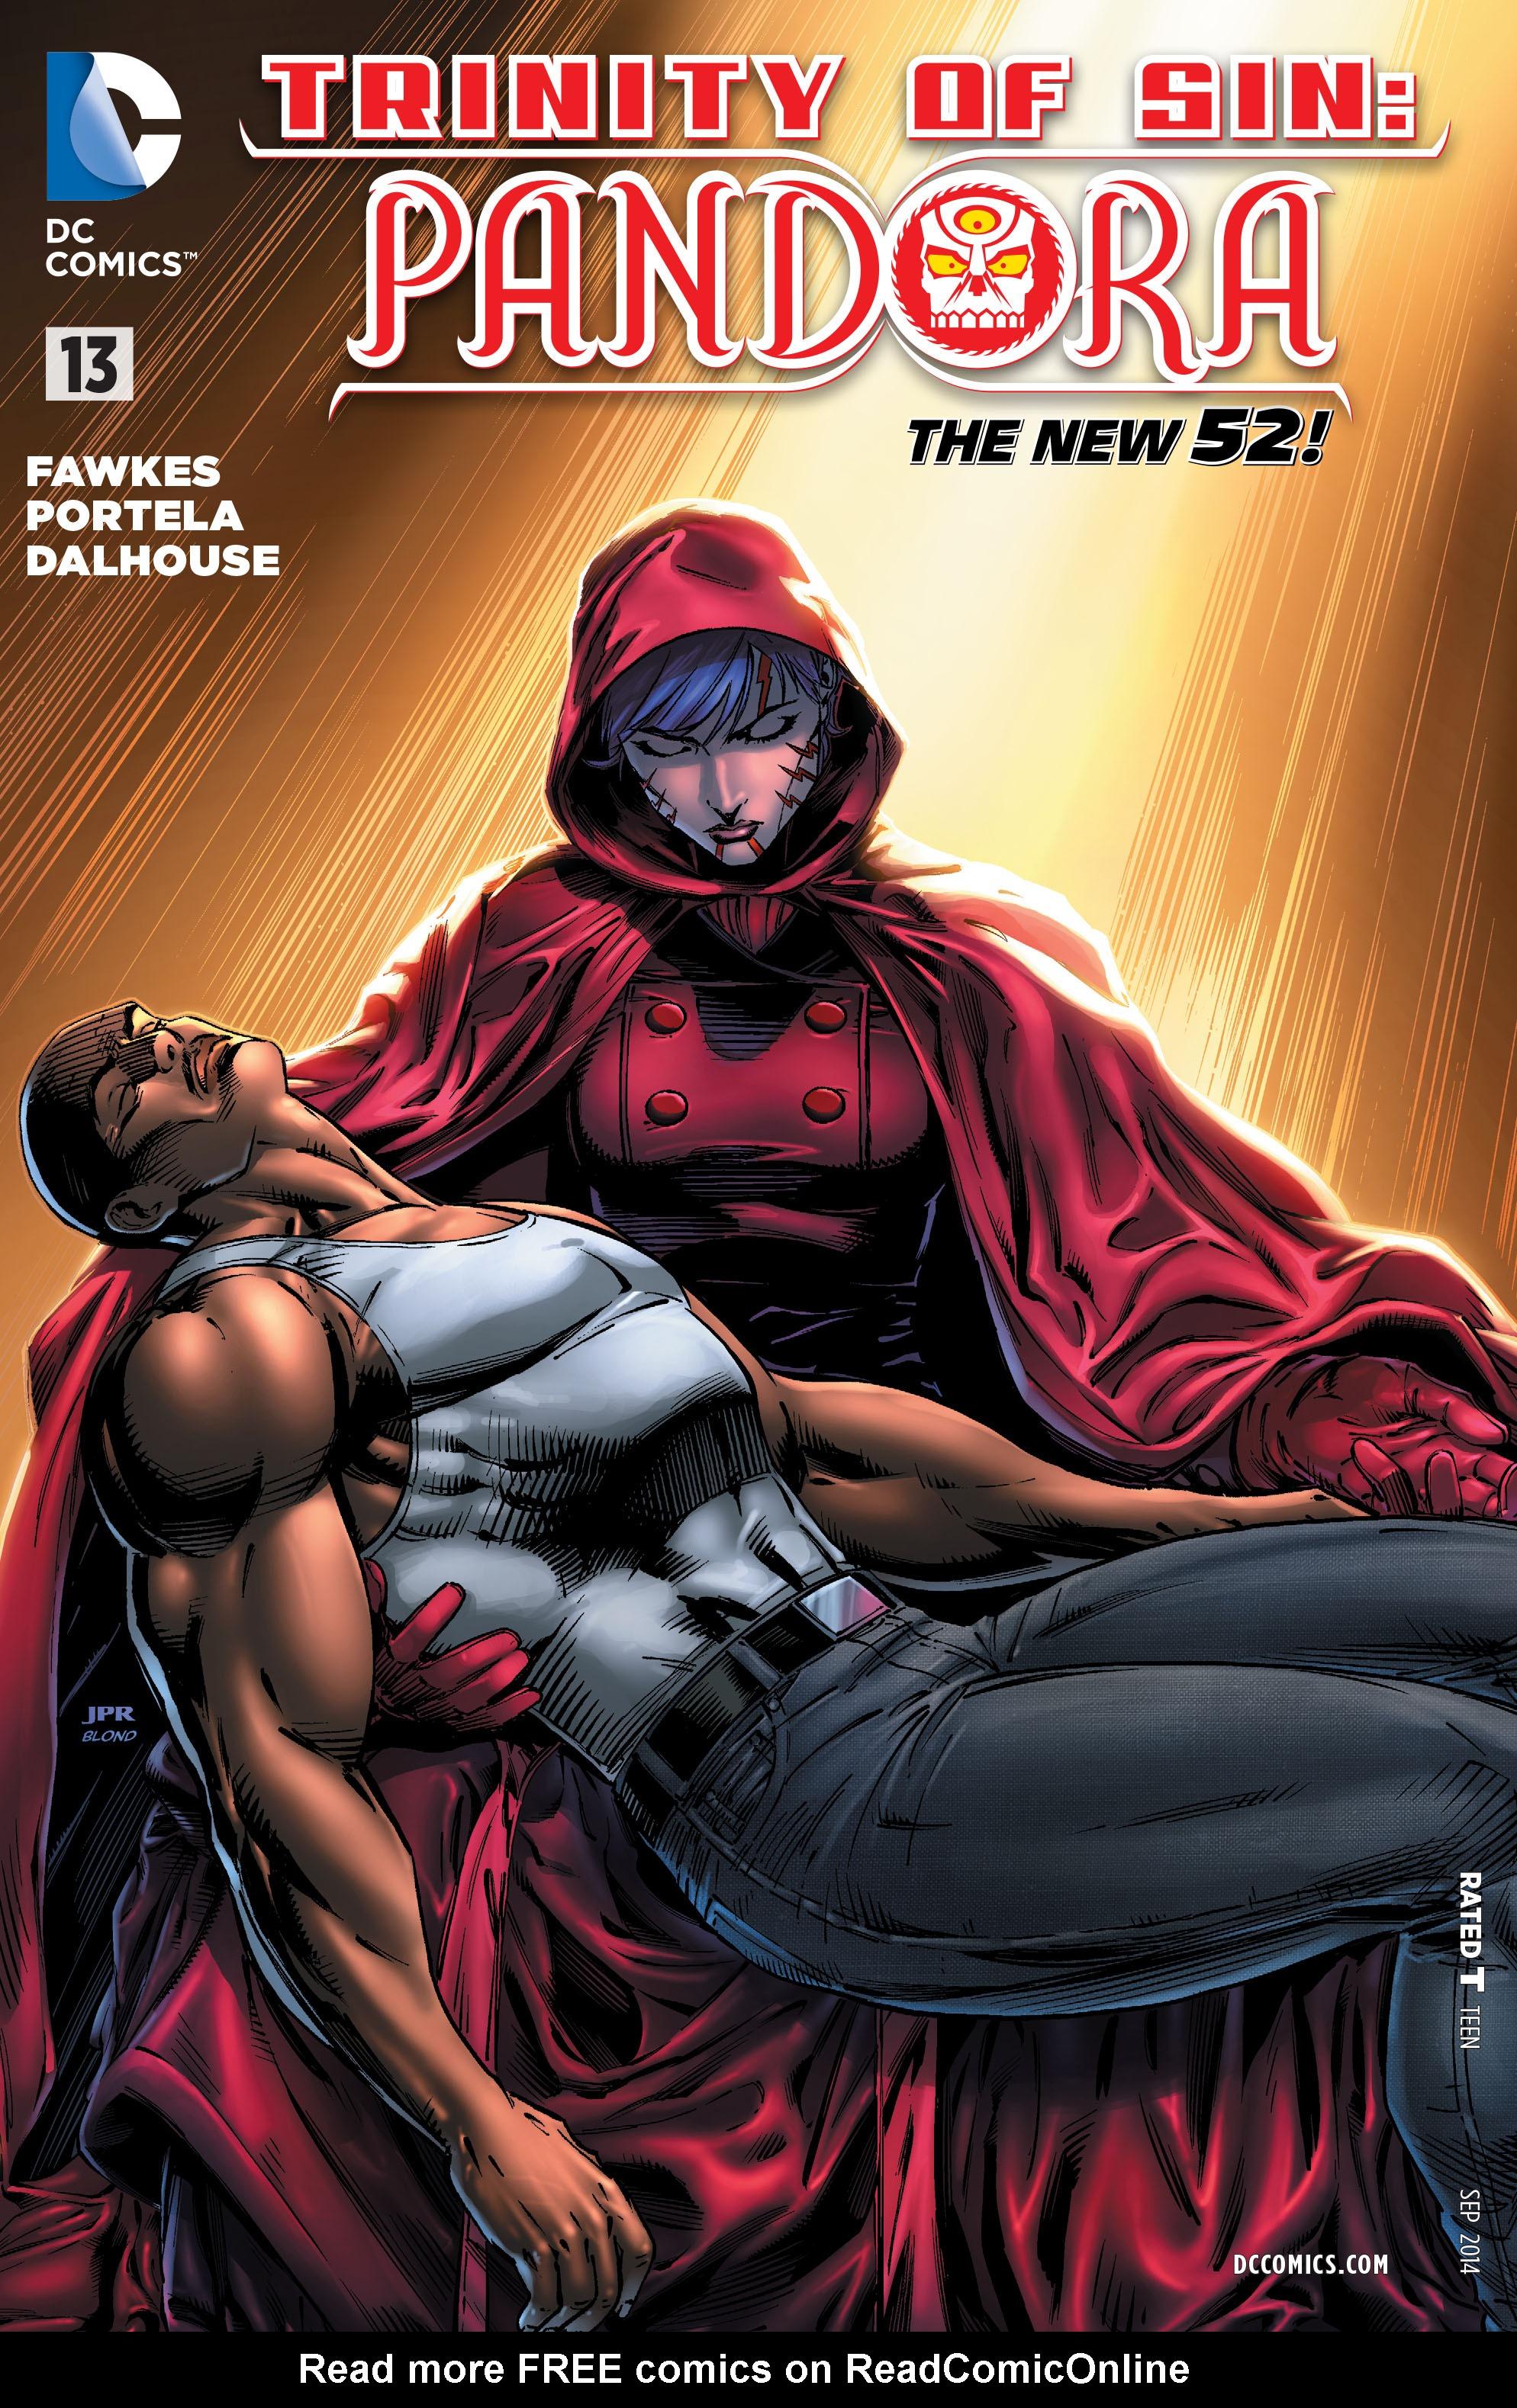 Read online Trinity of Sin: Pandora comic -  Issue #13 - 1